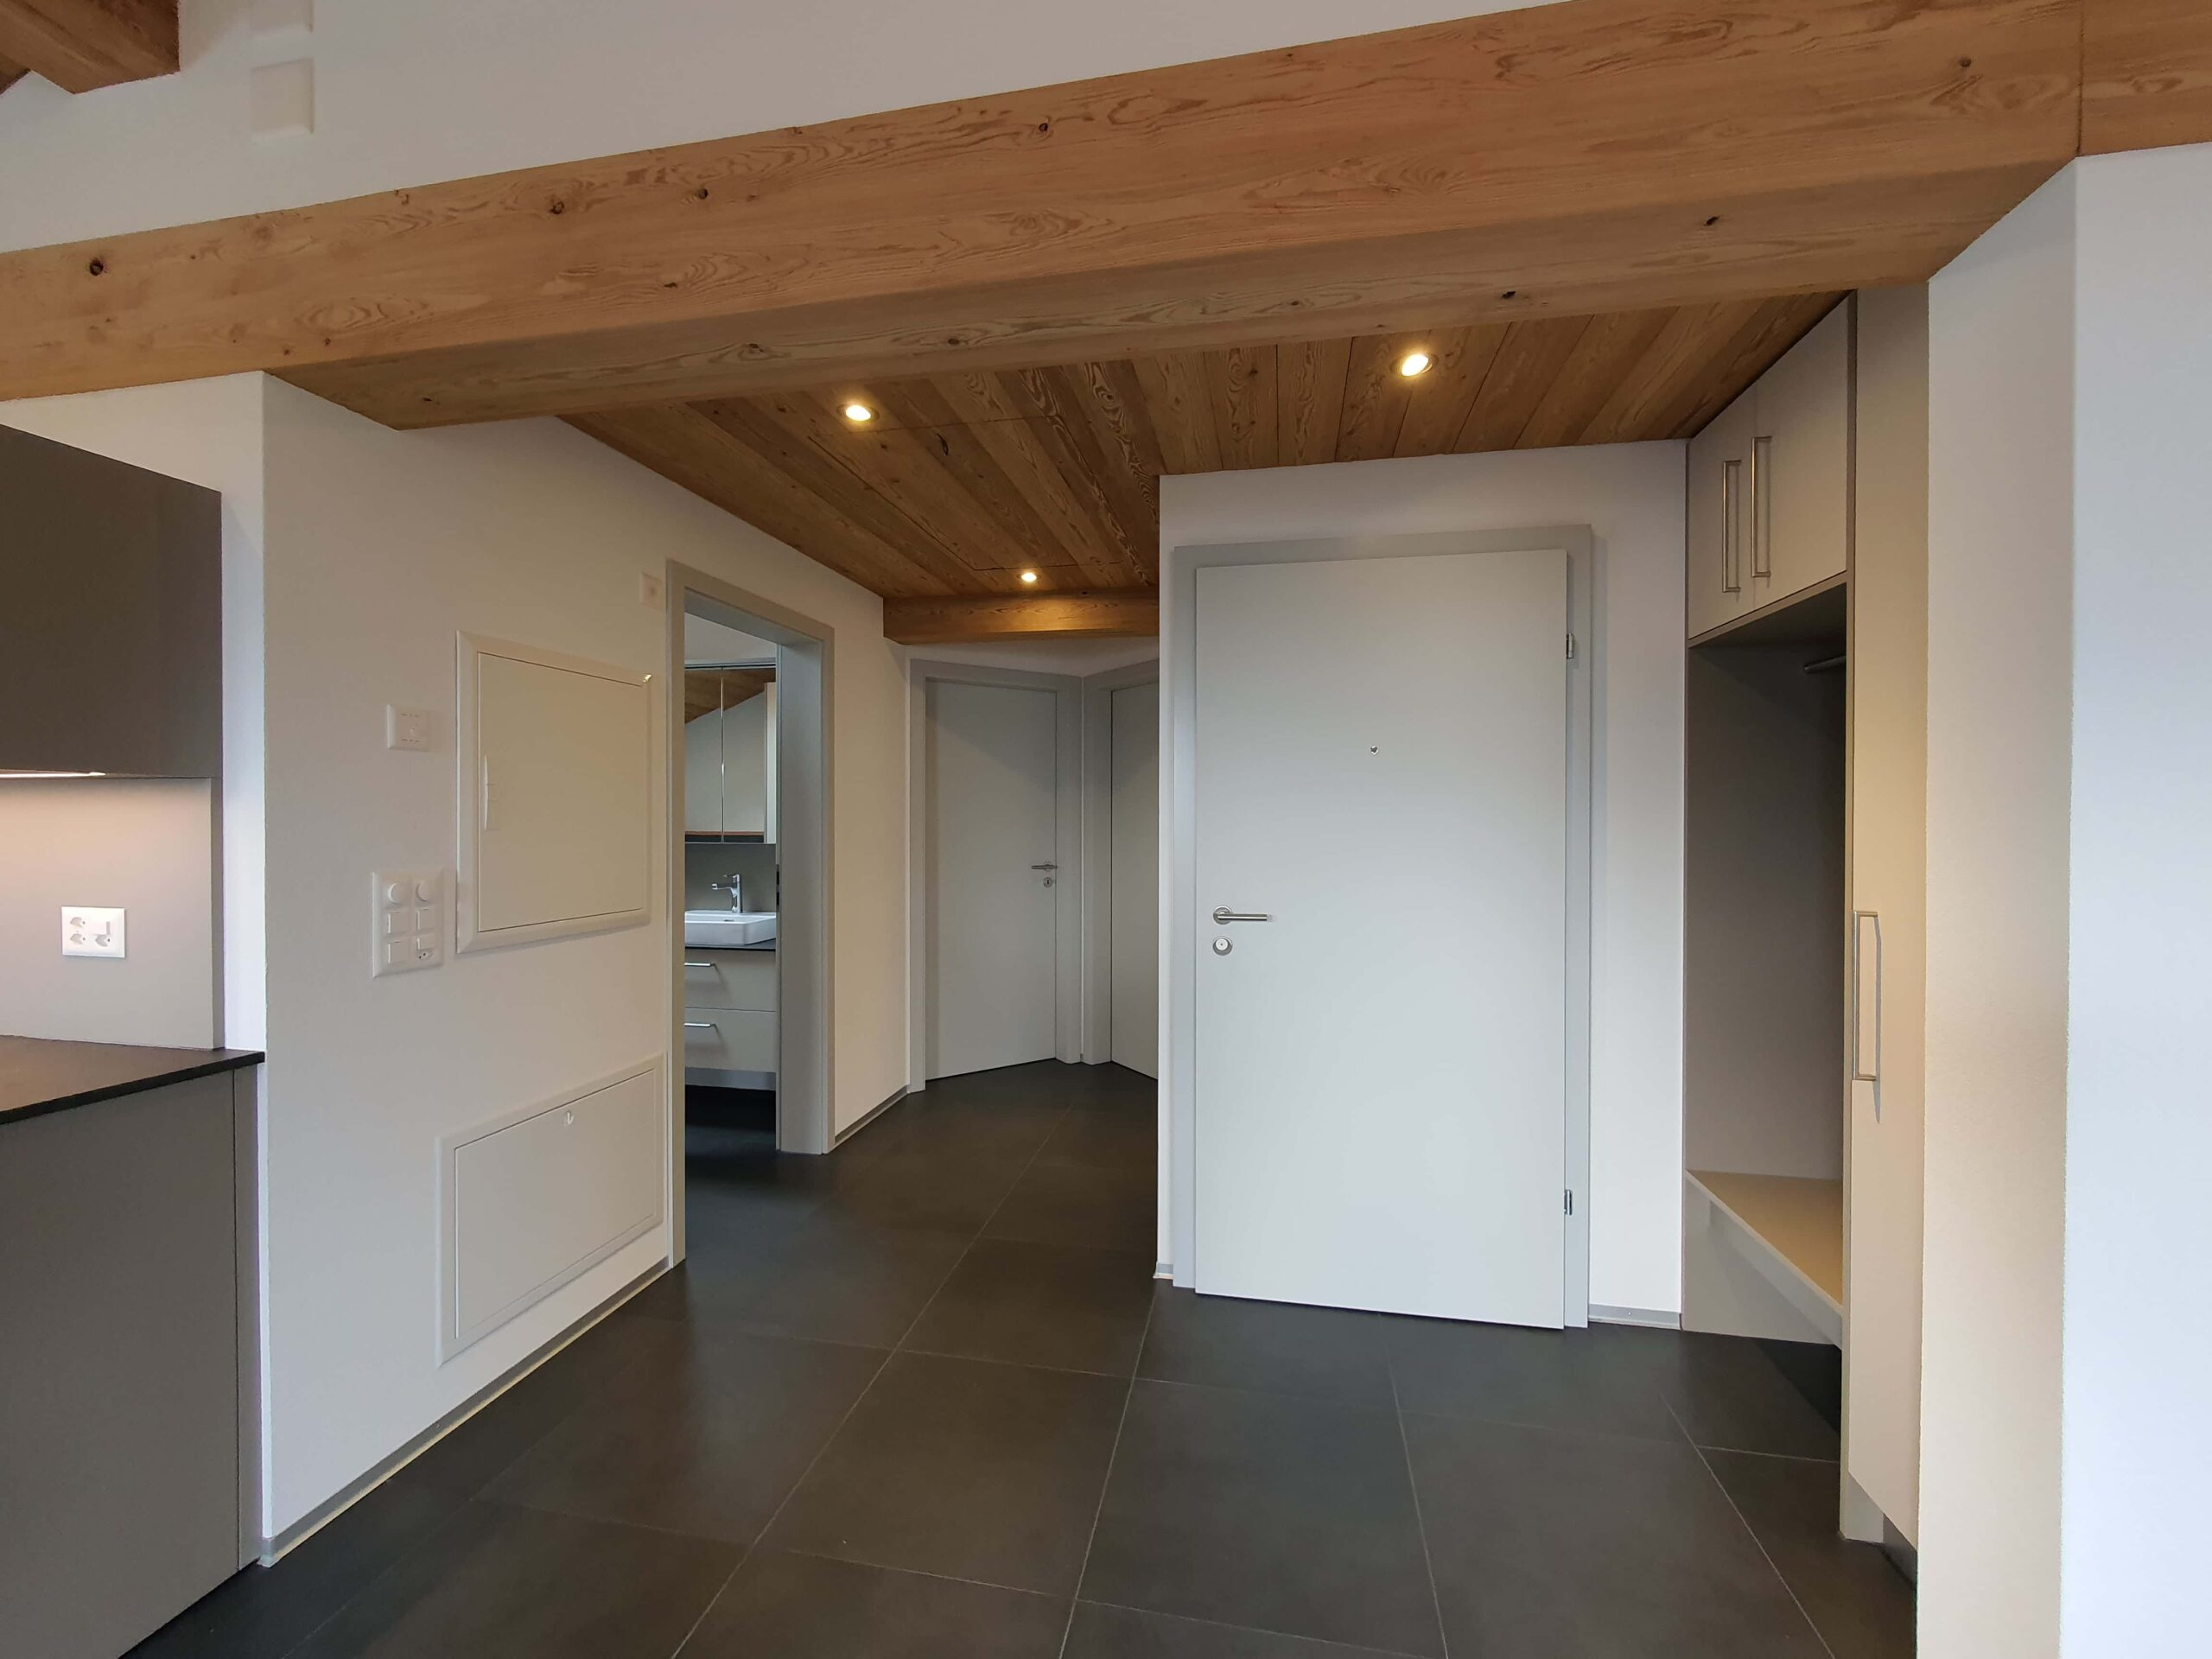 Wooddesign_Holzdesign_Altholz_rustikal_modern Holzdecke_Balkenverkleidung_Wandverkleidung_Wohnungumbau_Ausbau Wohnung (9)-min